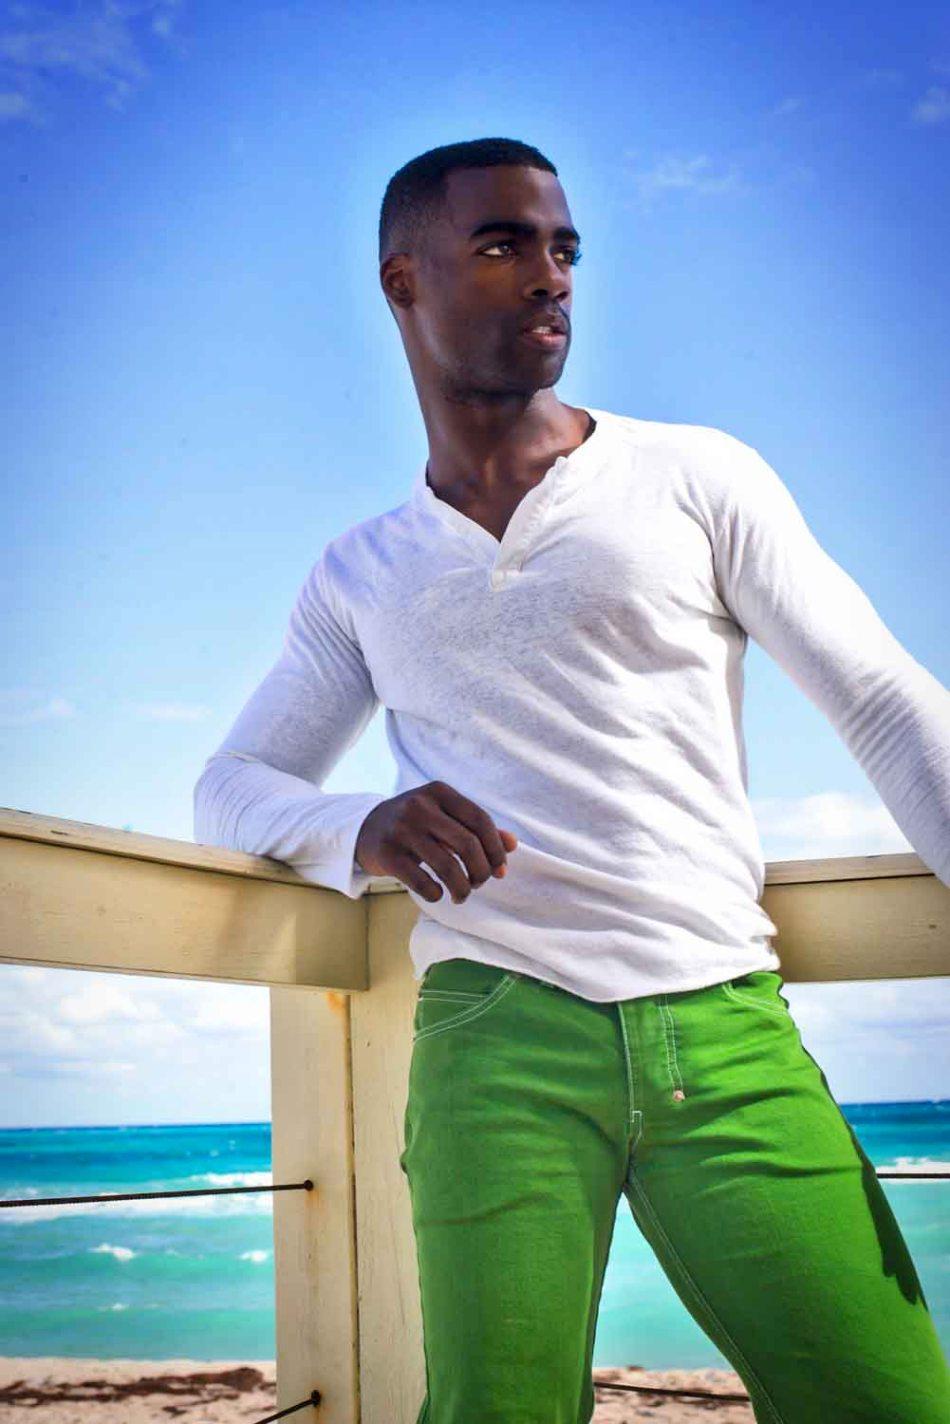 Jeremy Hubb by Ivan Sanchez for Fashionably Male3